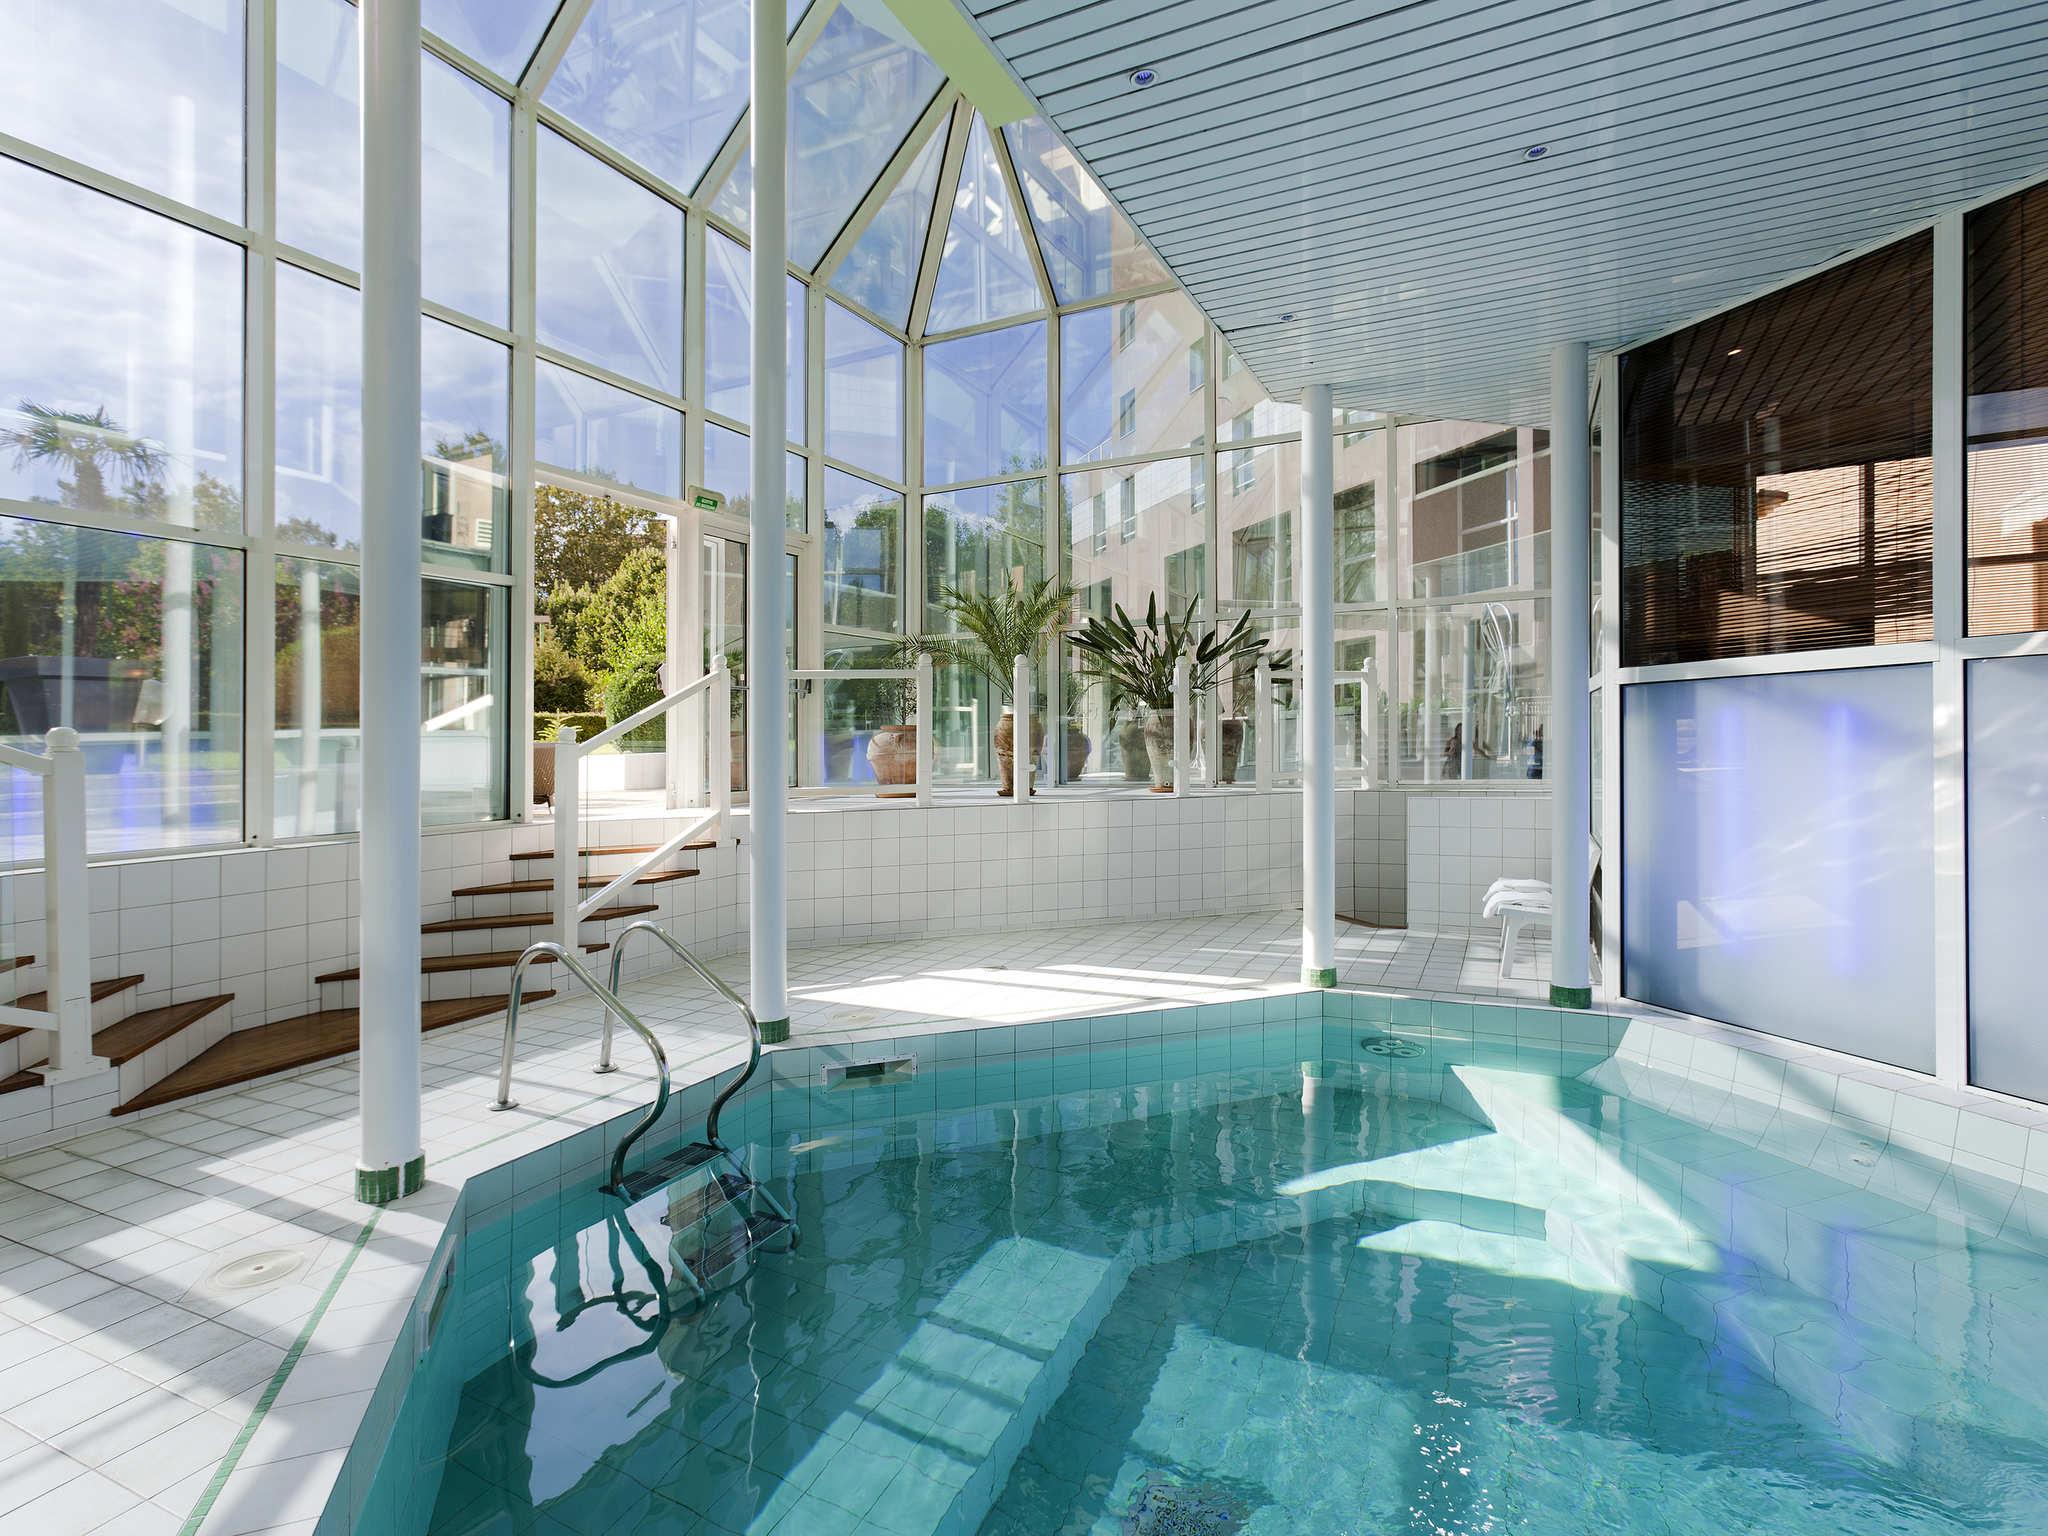 Hotell – Mercure Grenoble Centre Président